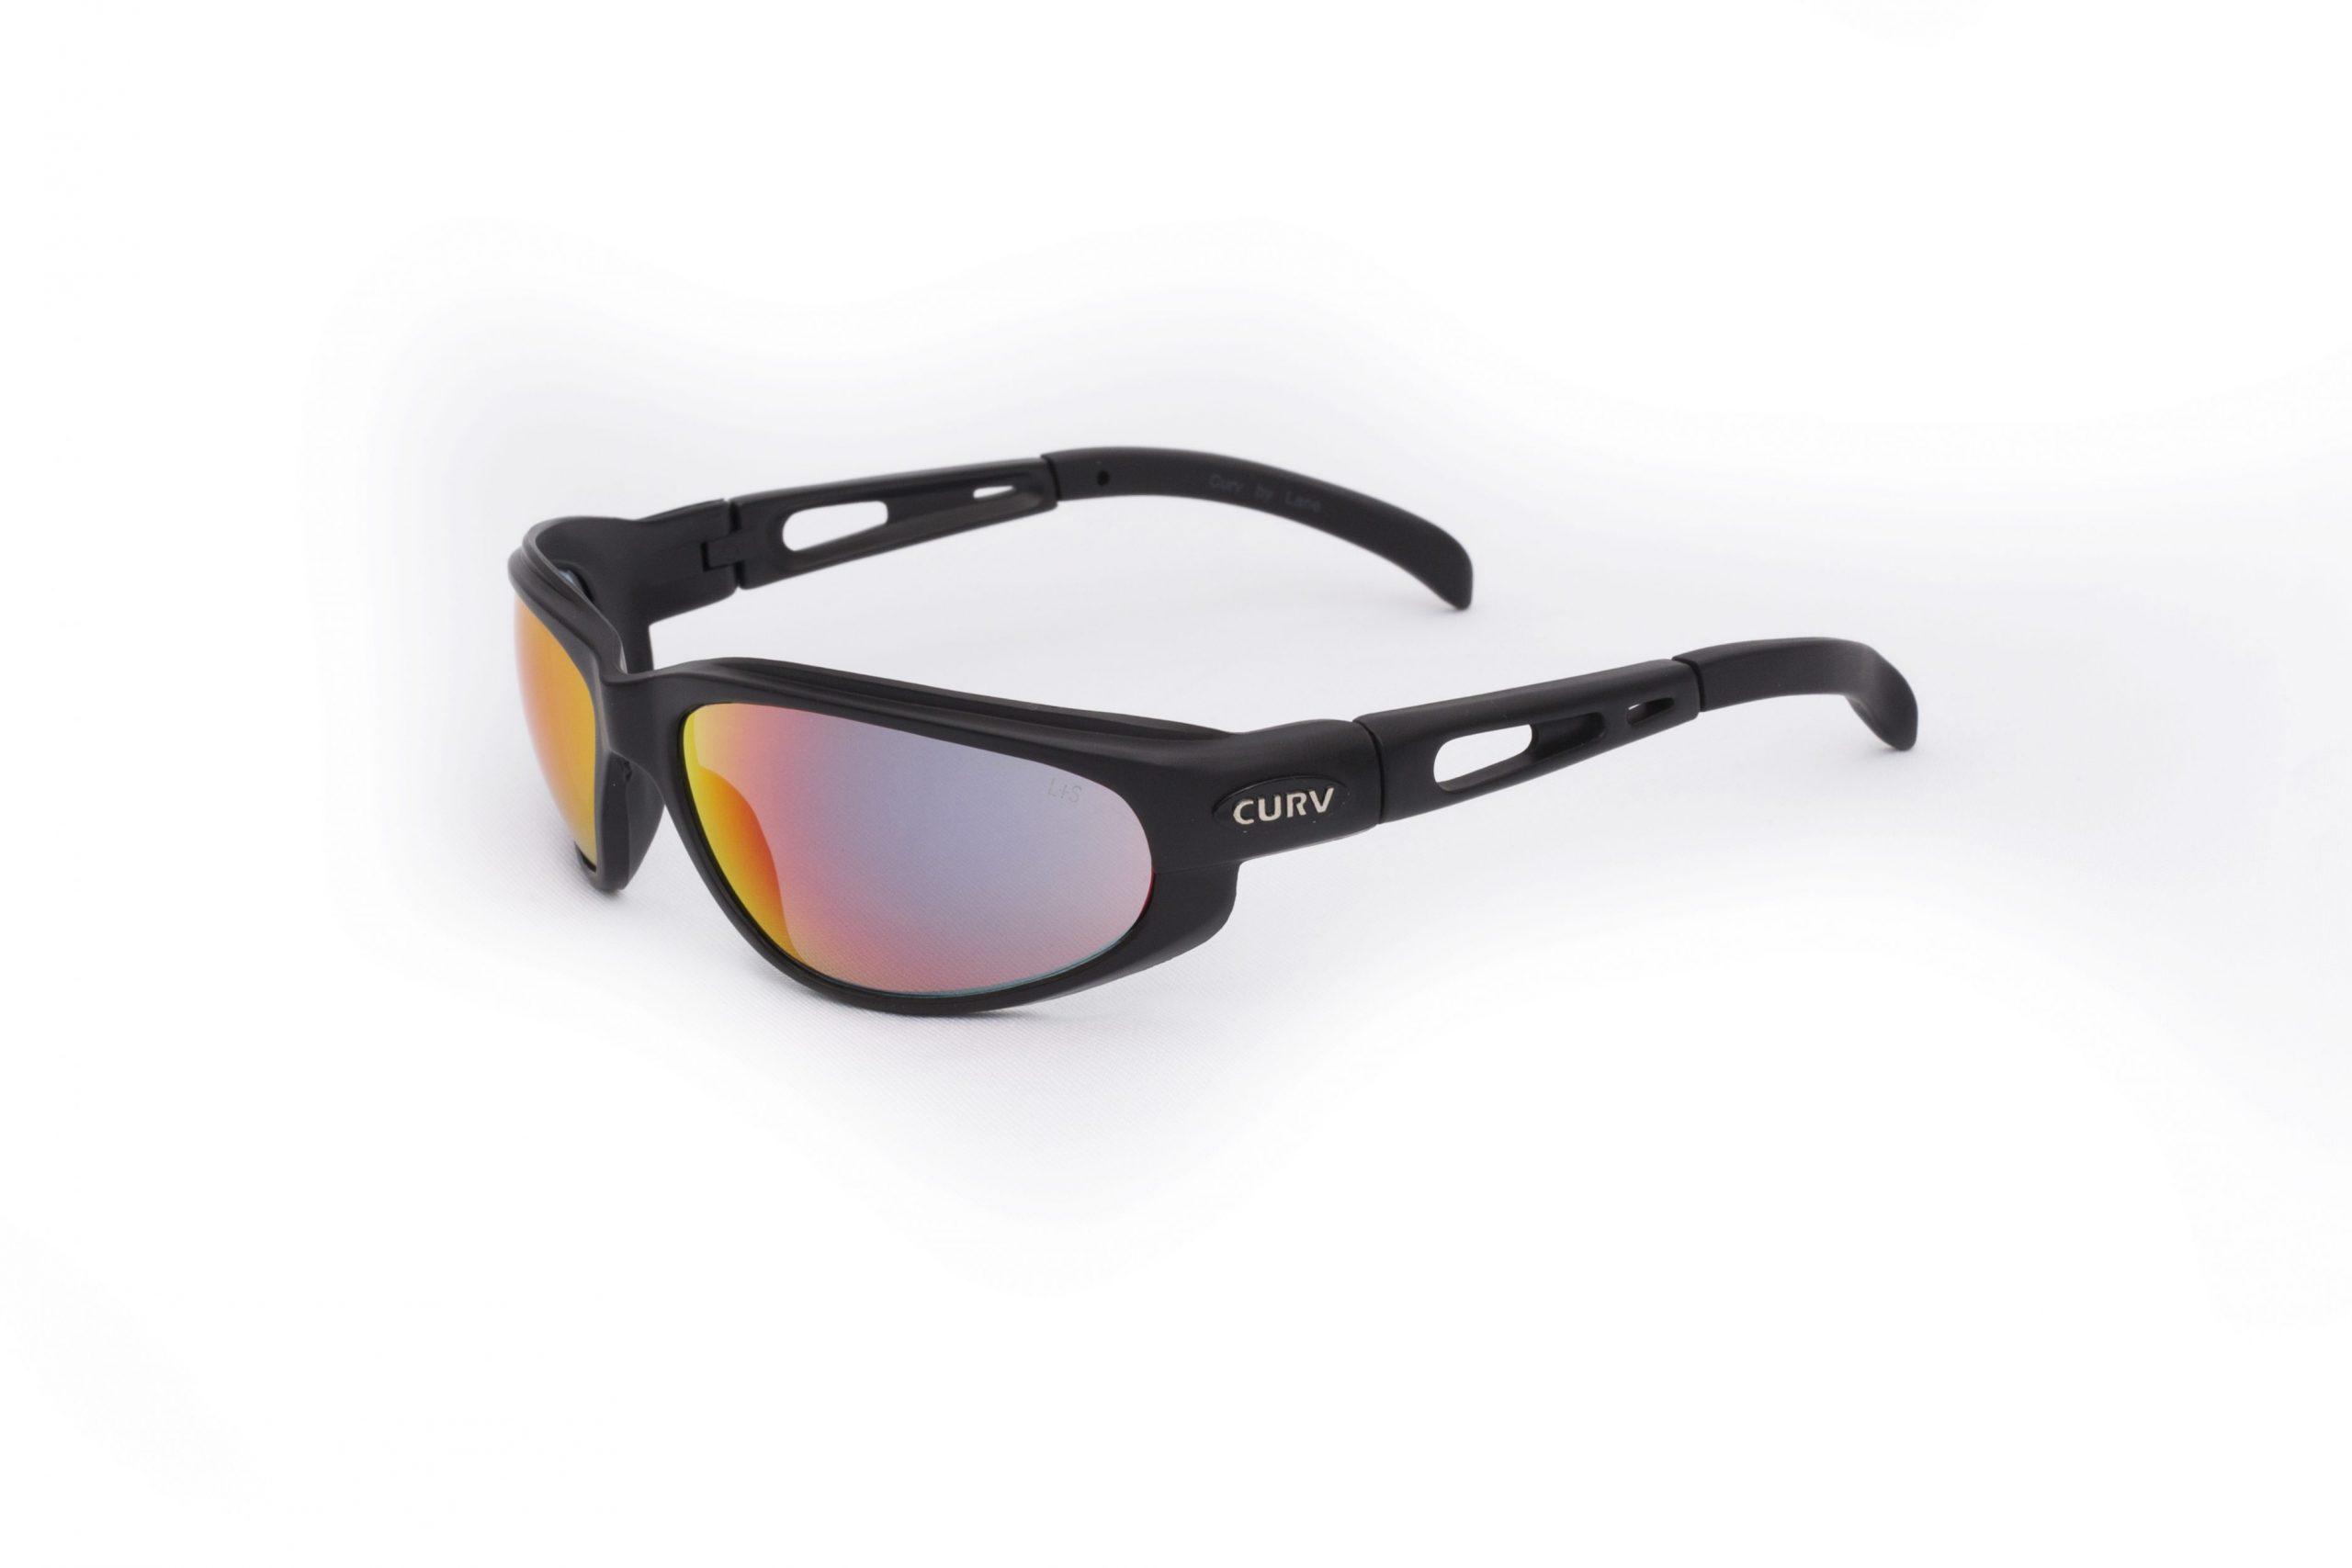 01-13 Curv Fire Red Sunglasses